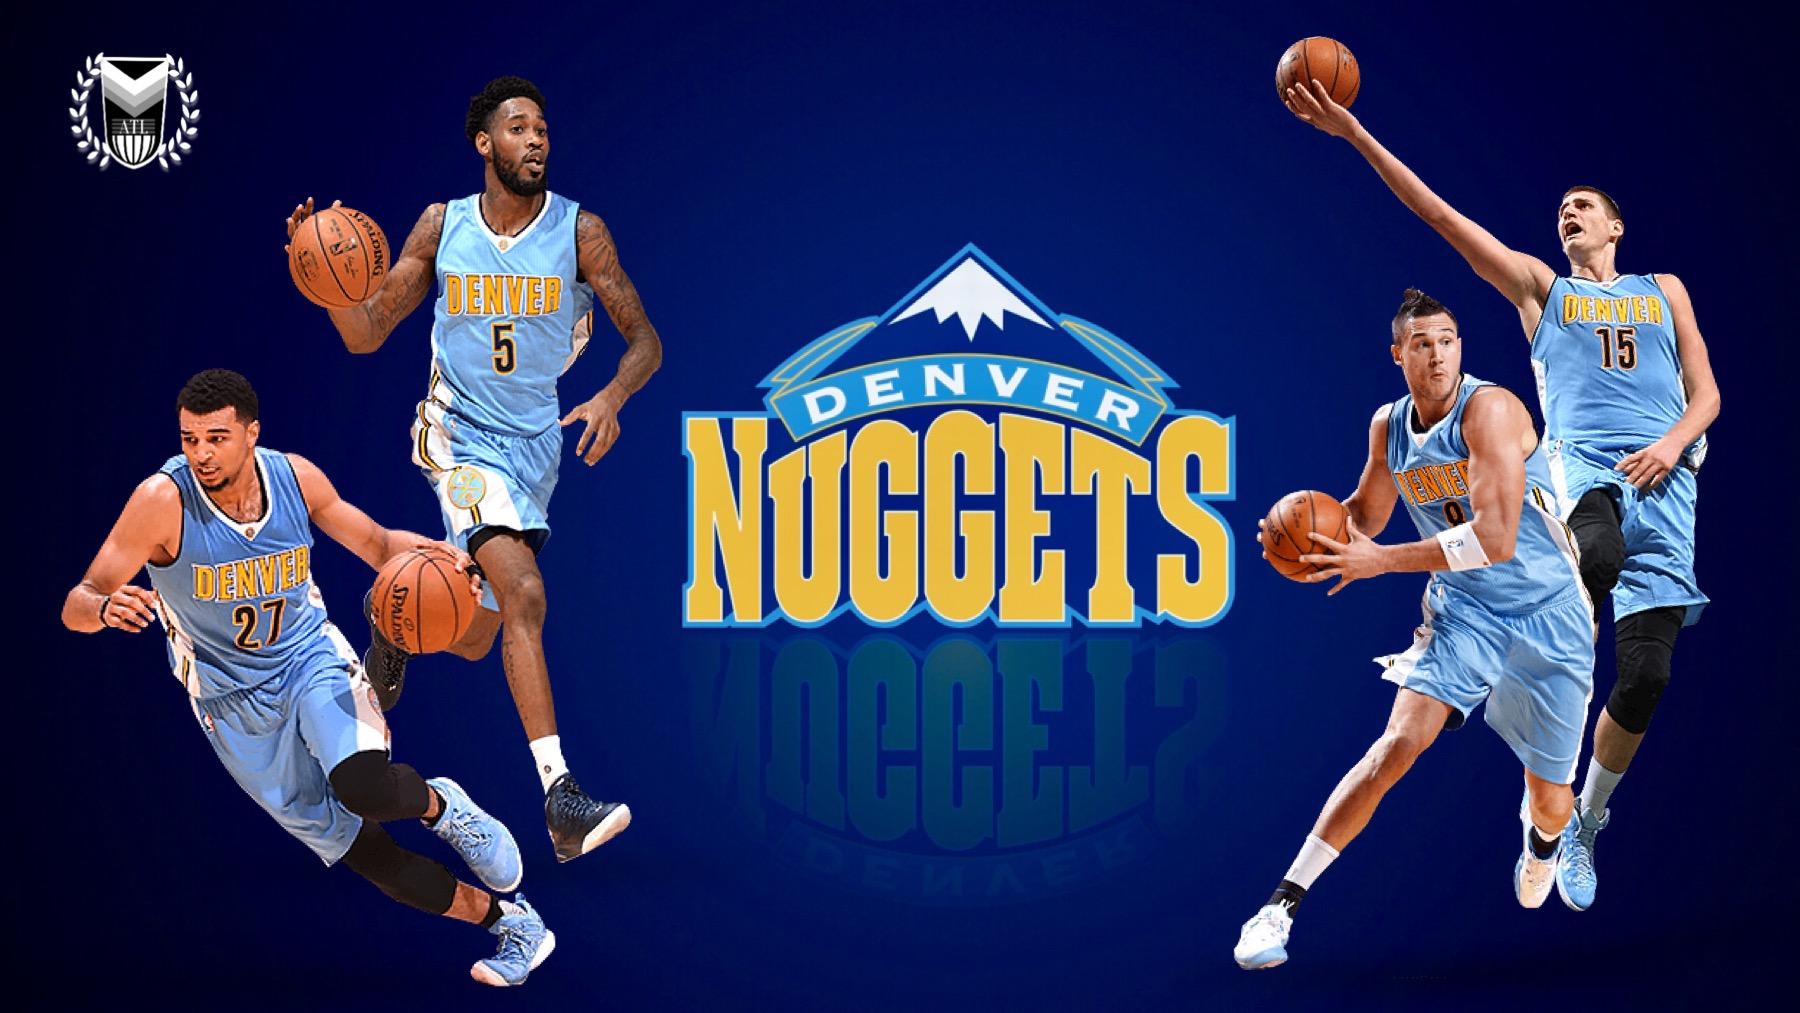 The Denver Nuggets' Four Factors after 35 games